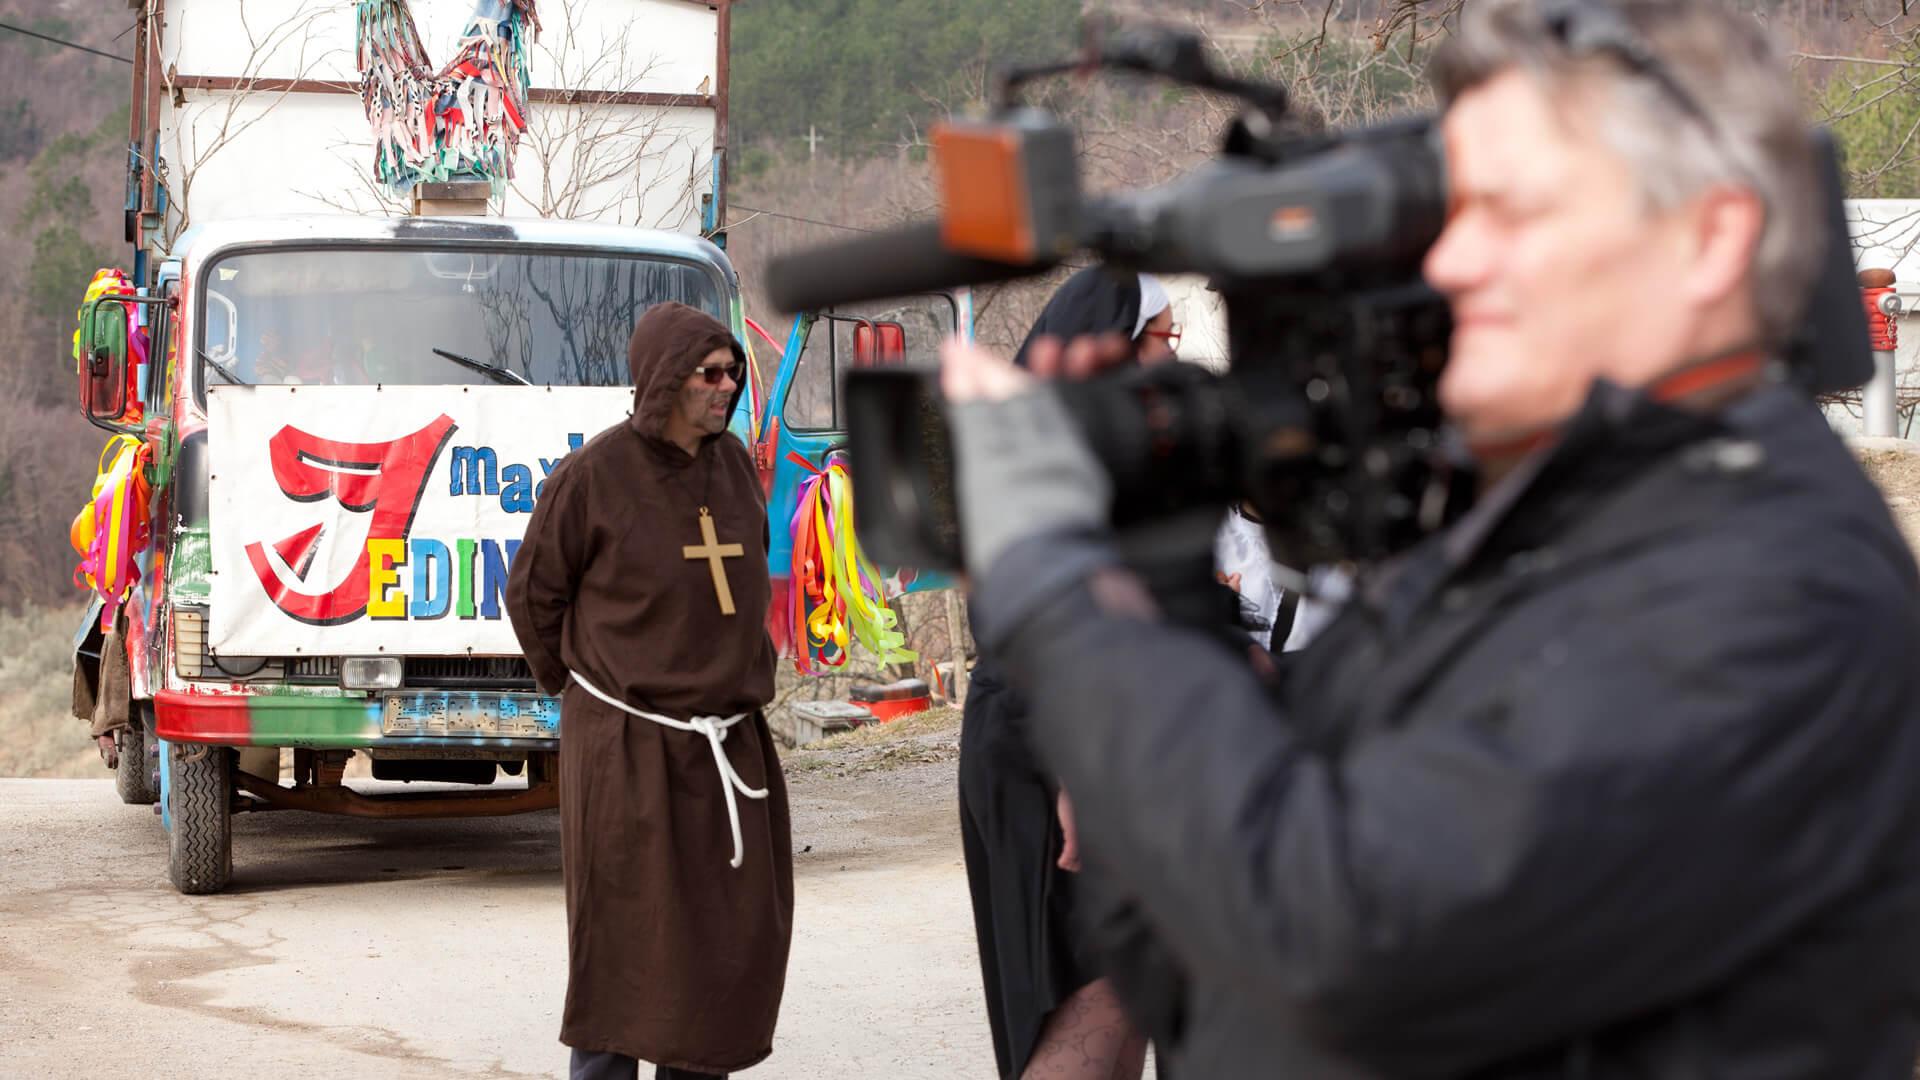 Lars filmt den Karnevalsumzug in Buzet